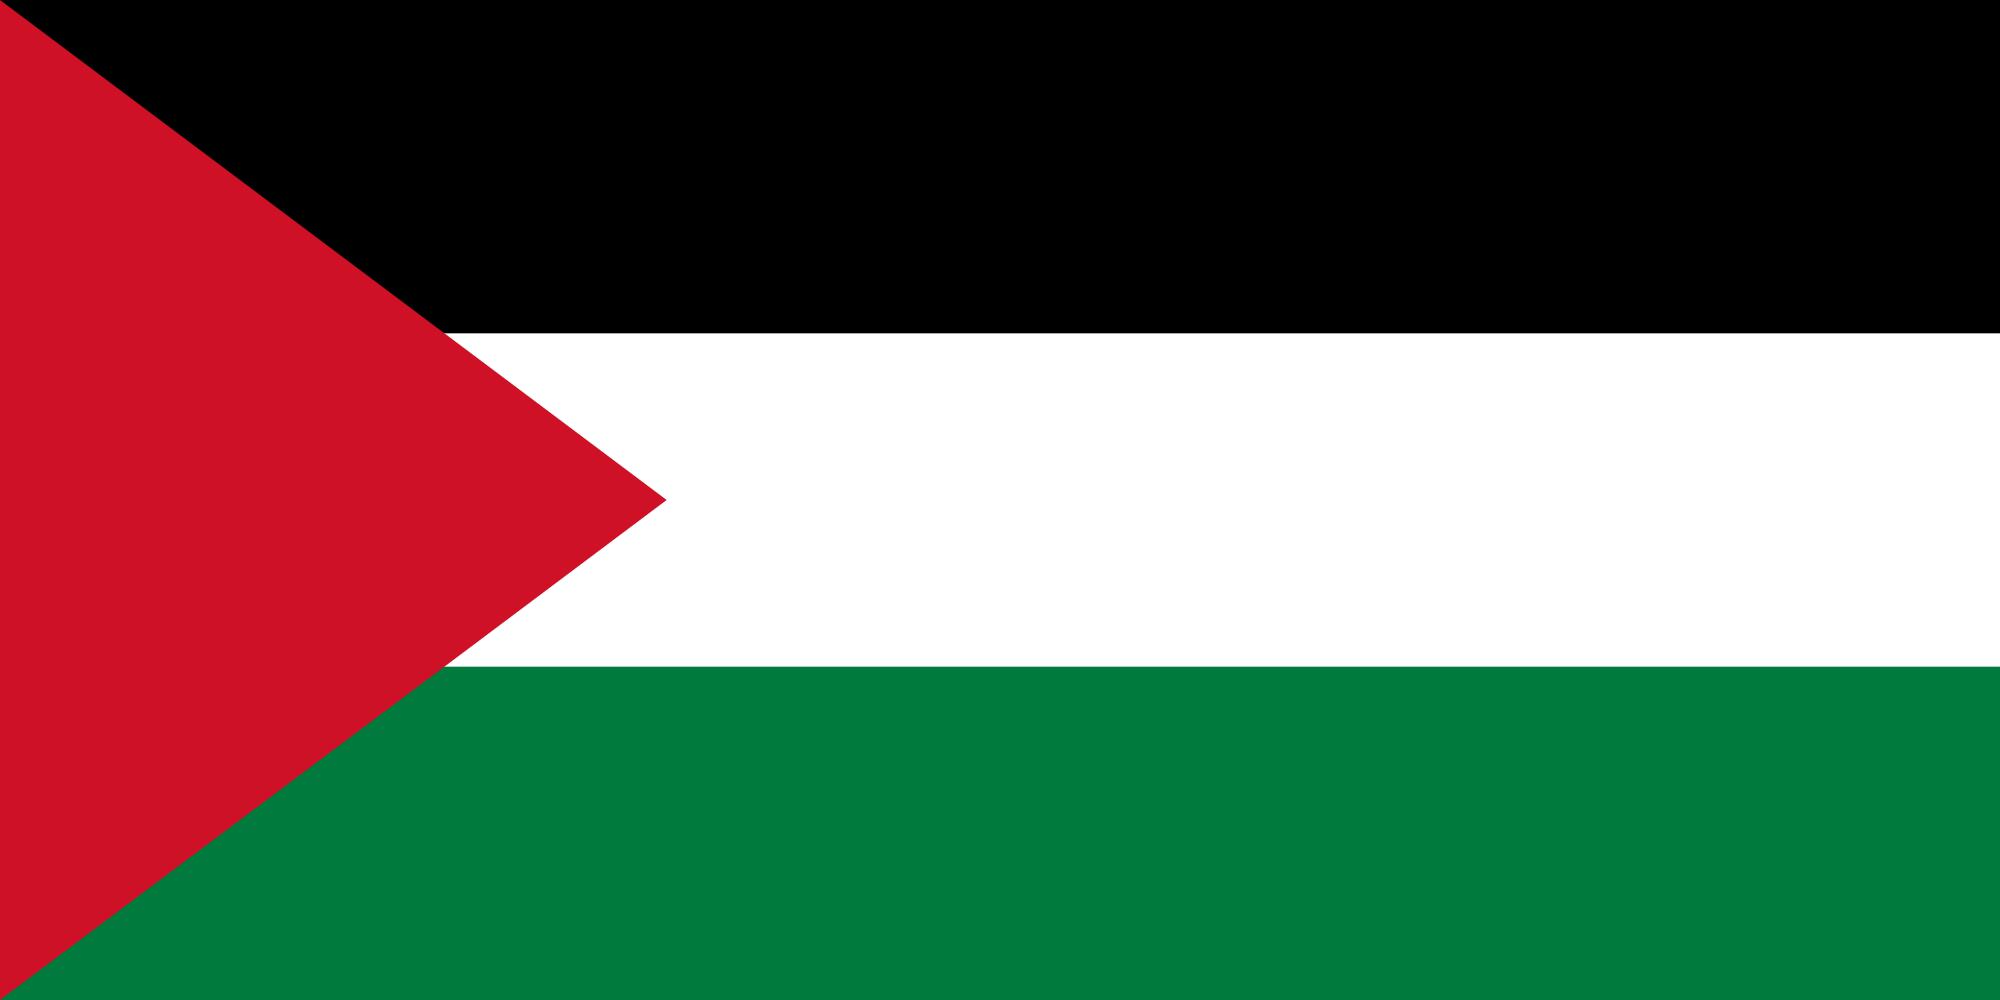 palestina, страна, Эмблема, логотип, символ - Обои HD - Профессор falken.com